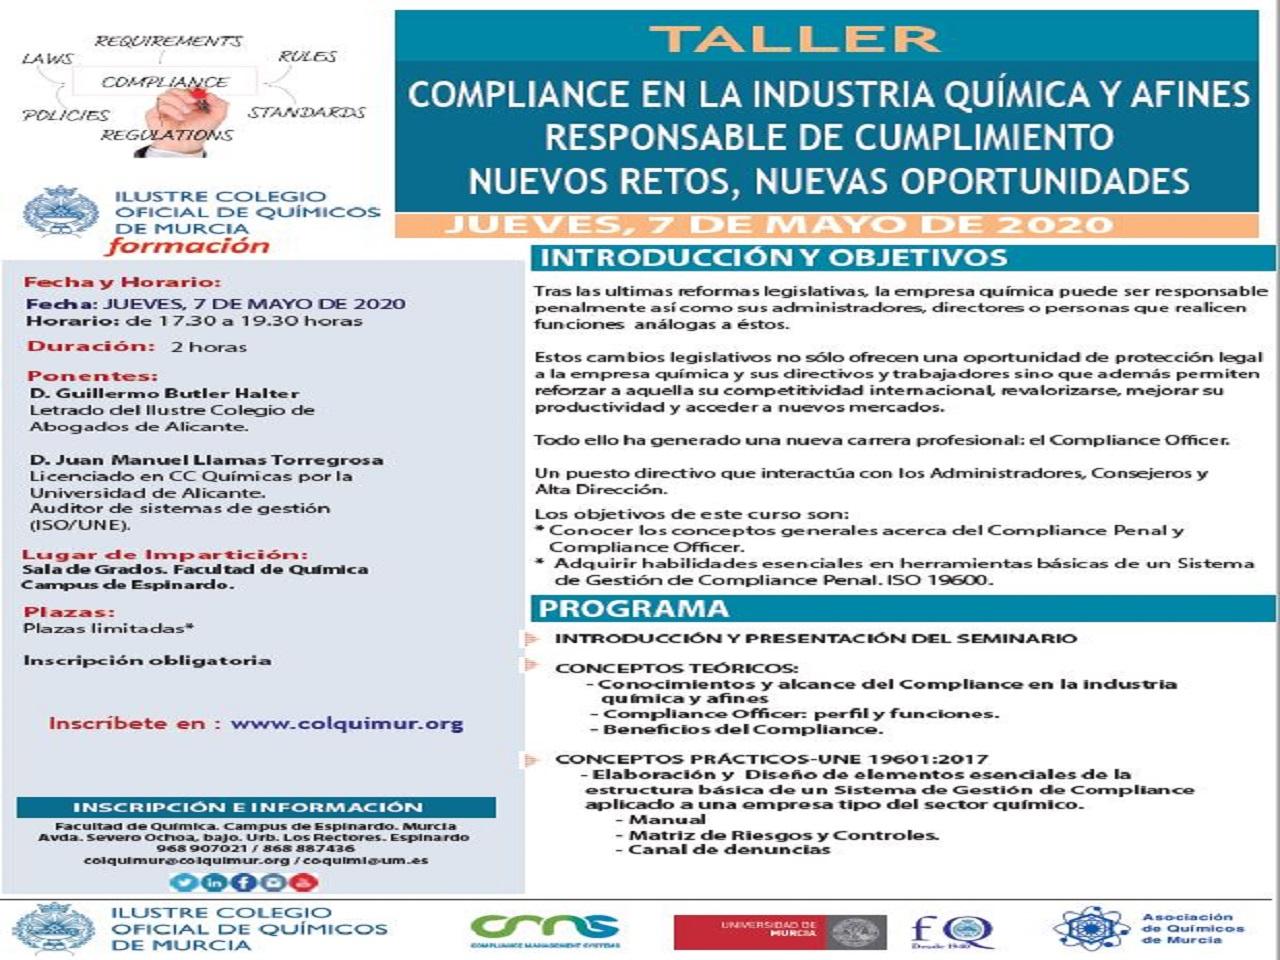 TALLER SOBRE EL COMPLIANCE EN LA INDUSTRIA QUIMICA. COMPLIANCE OFFICER